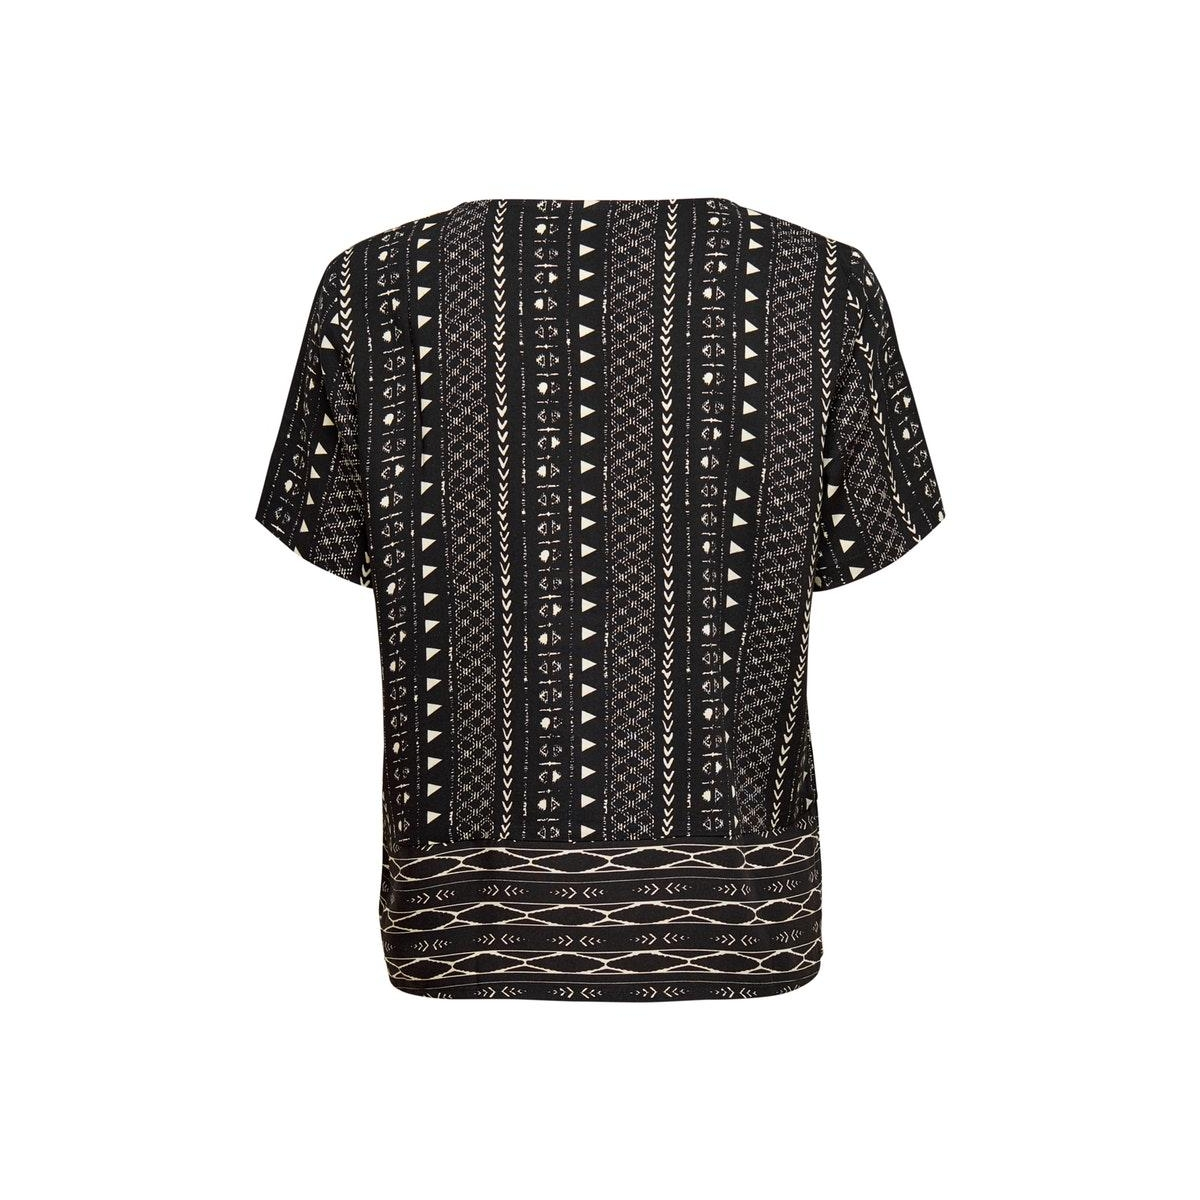 jdytiffany s/s top wvn 15201474 jacqueline de yong t-shirt black/sandshell